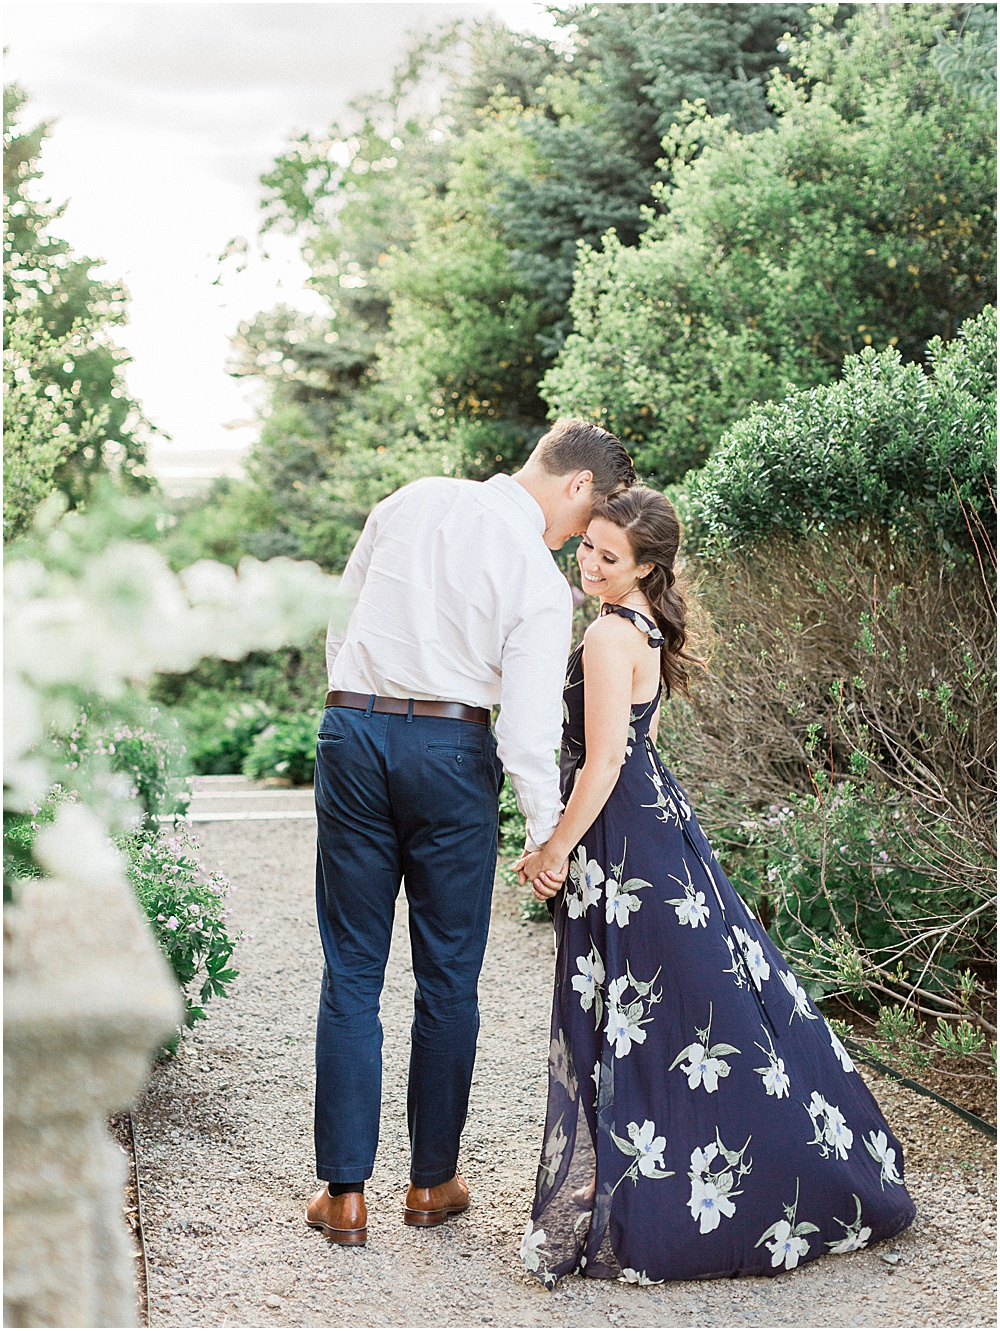 crane_estate_beach_engagement_ipswich_les_fleurs_andover_lyndsay_simon_beauty_massachusetts_boston_wedding_photographer_meredith_jane_photography_photo_0324.jpg